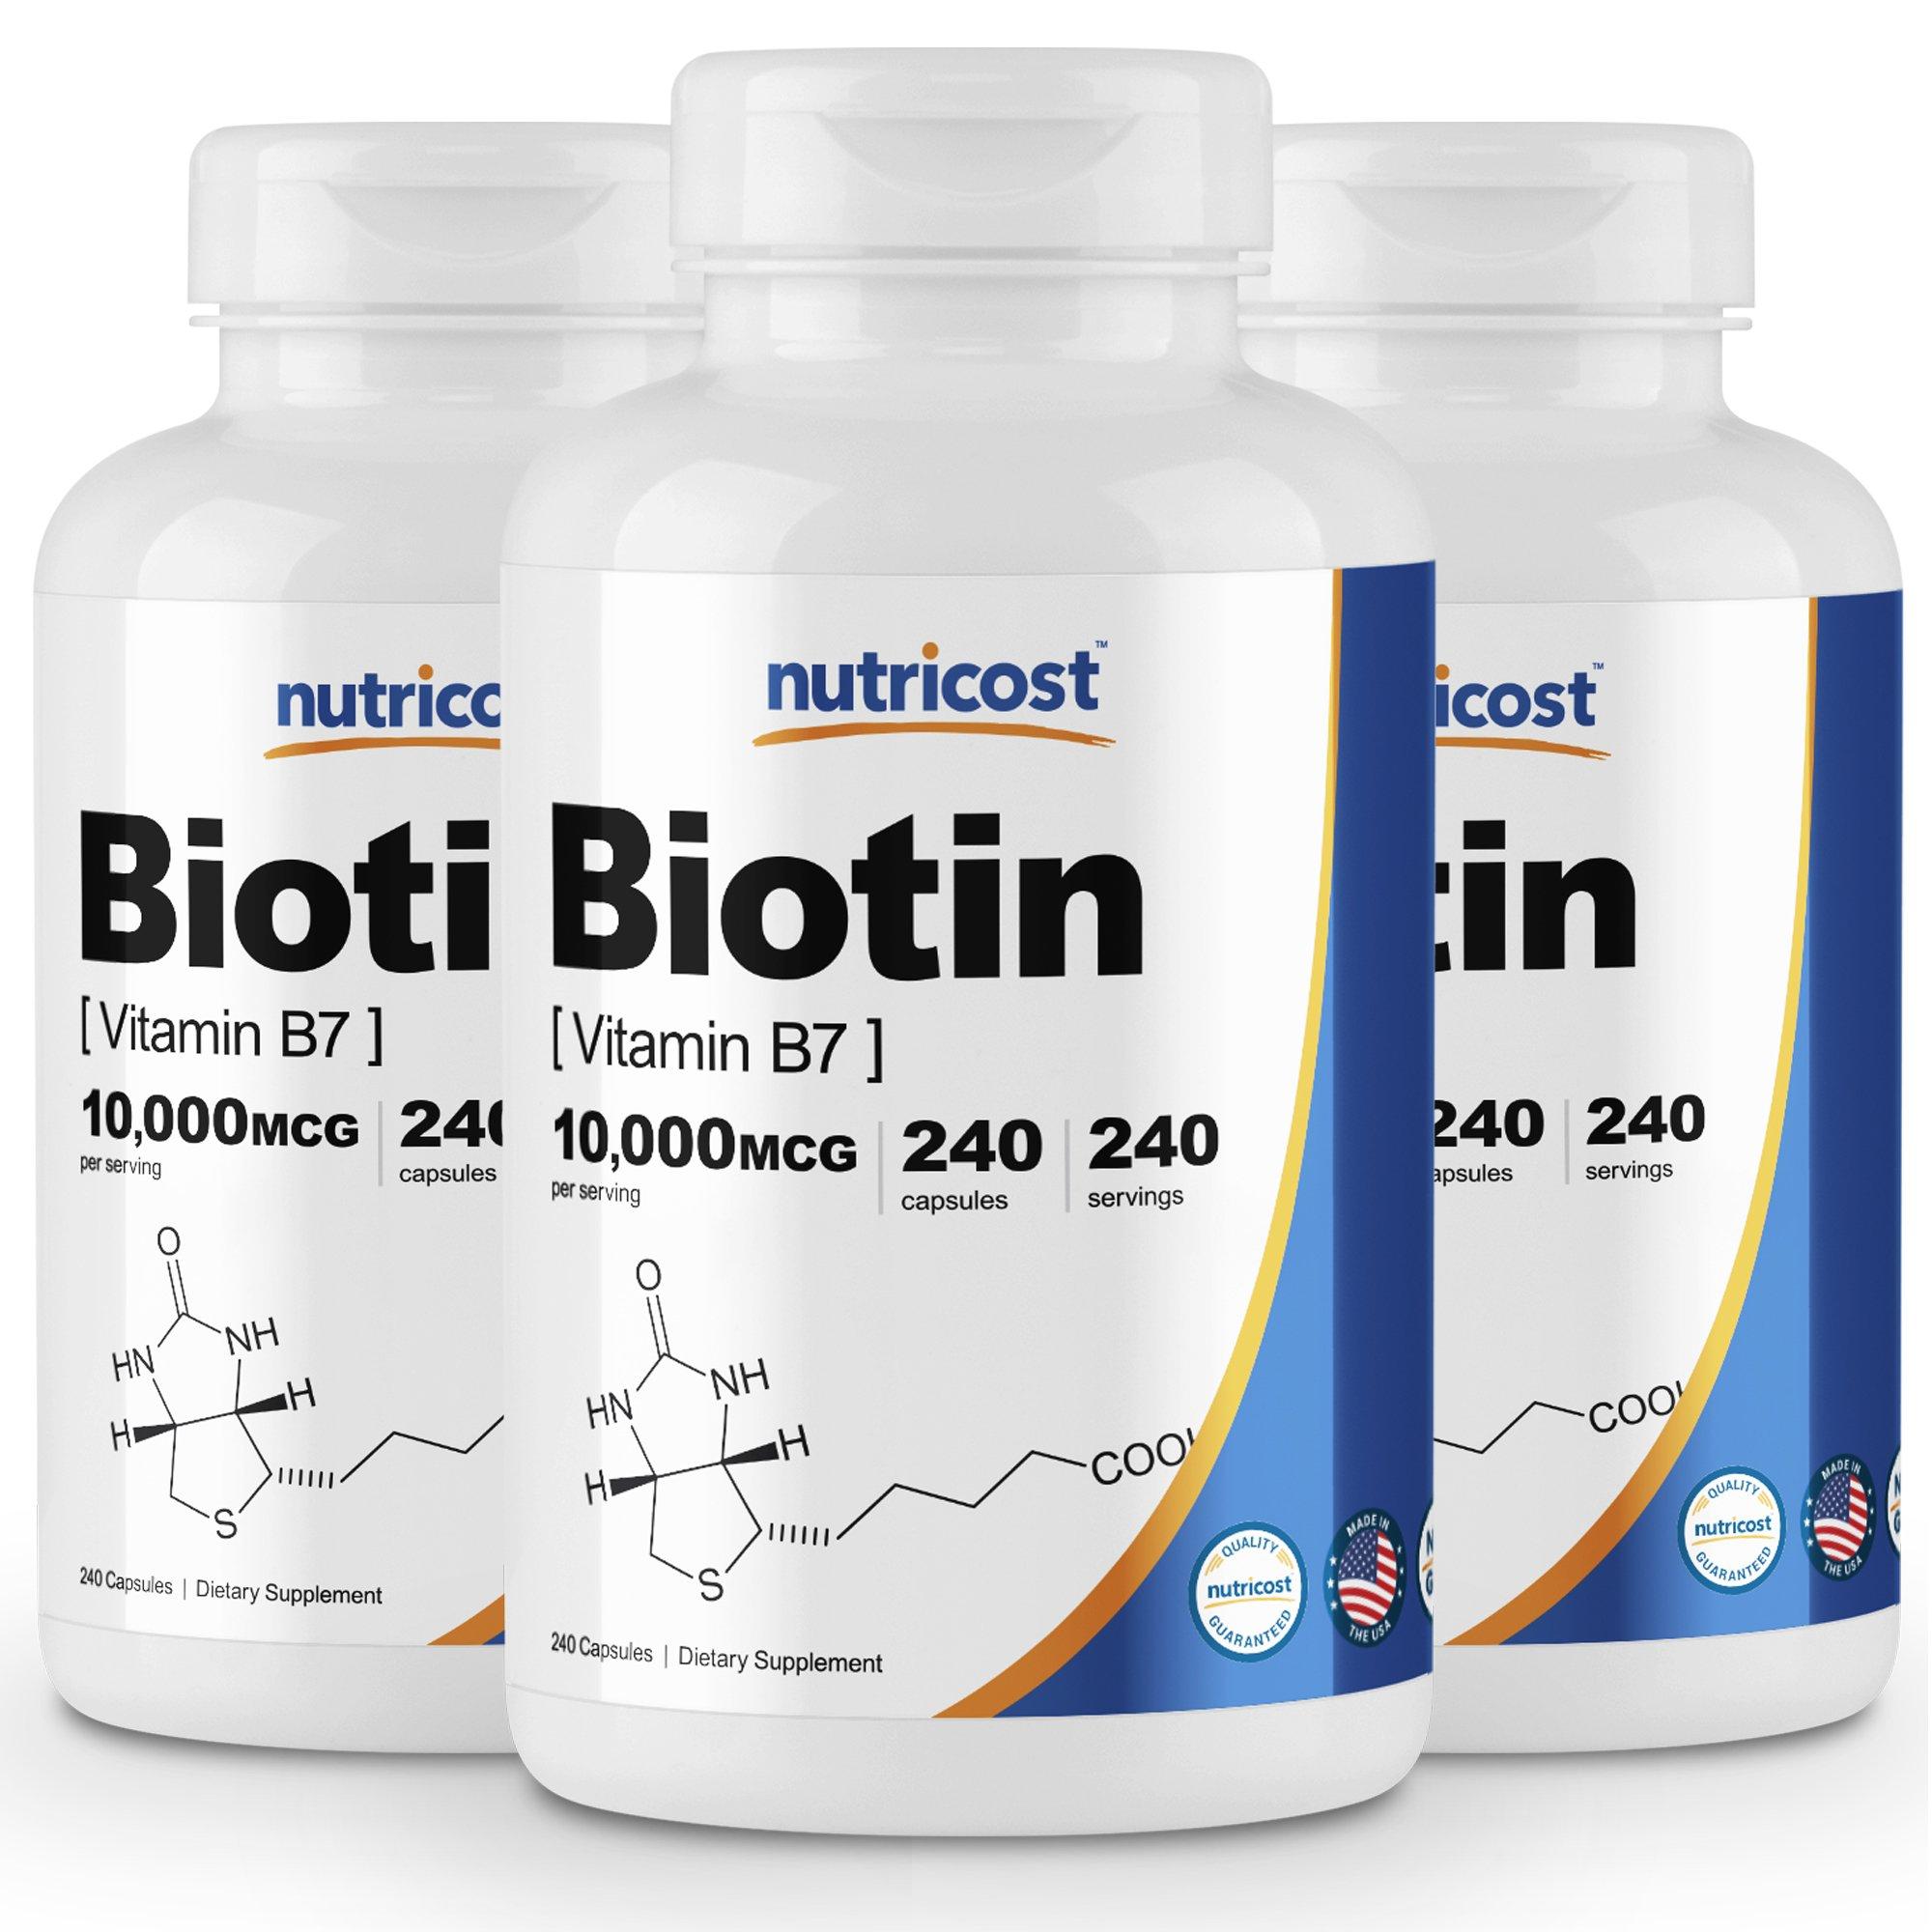 Nutricost Biotin (Vitamin B7) 10,000mcg, 240 Caps (3 Bottles) - Non-GMO, Gluten Free by Nutricost